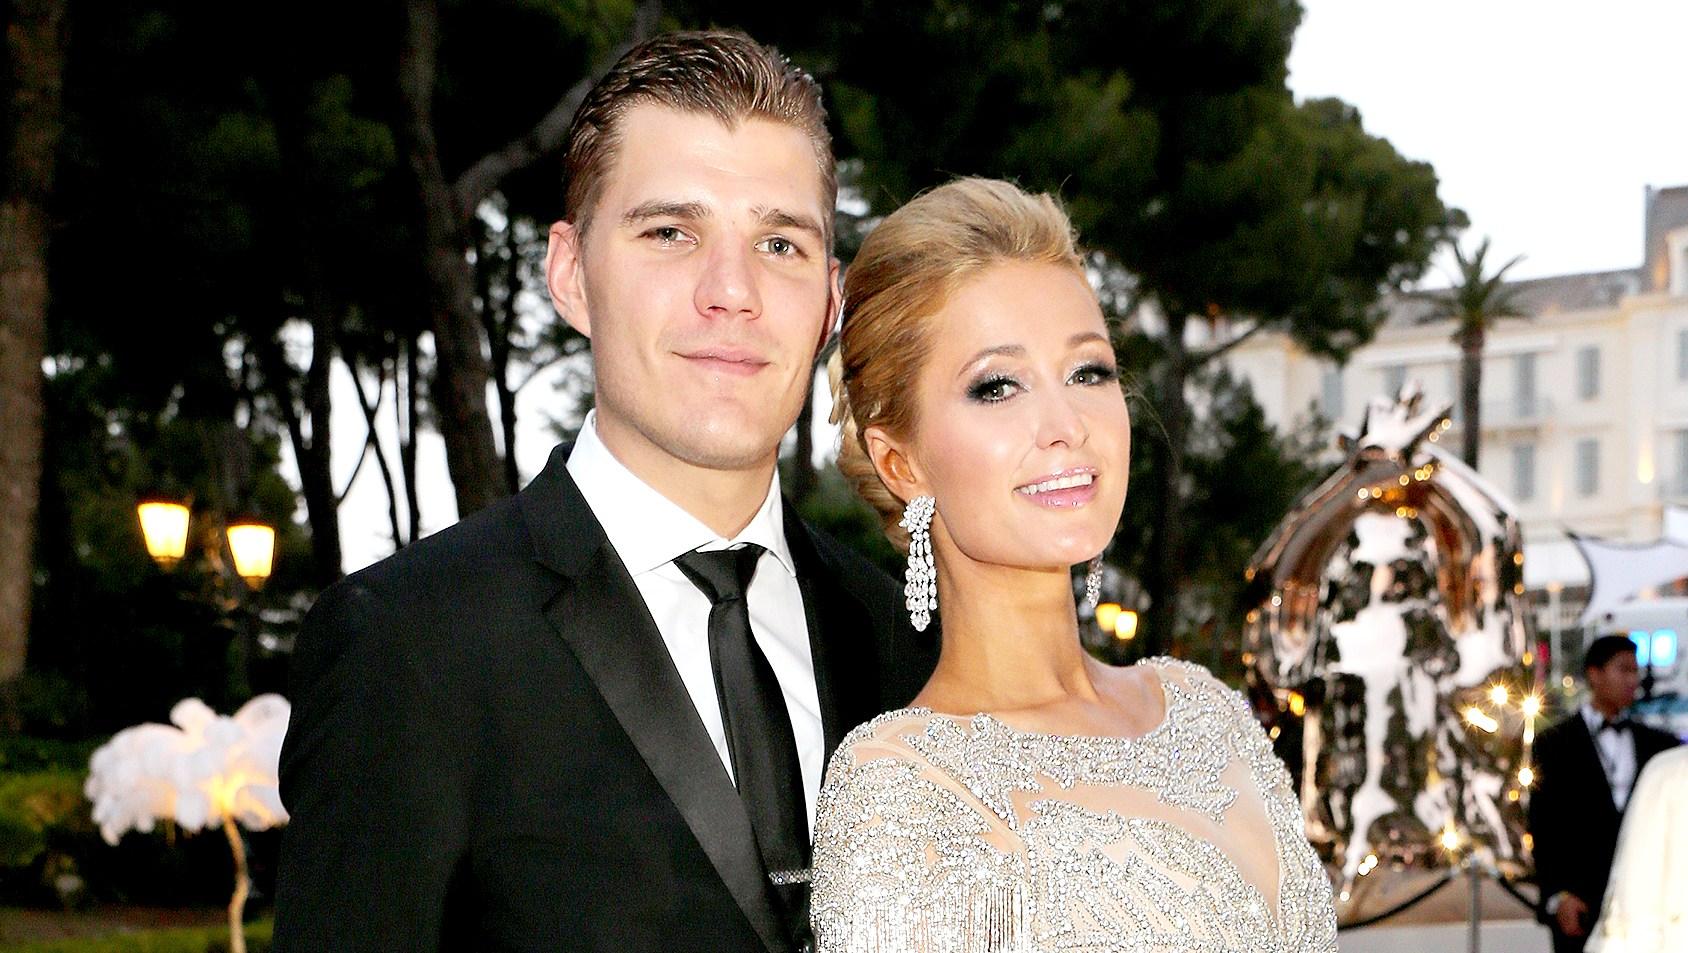 Paris-Hilton-and-Chris-Zylka-wedding